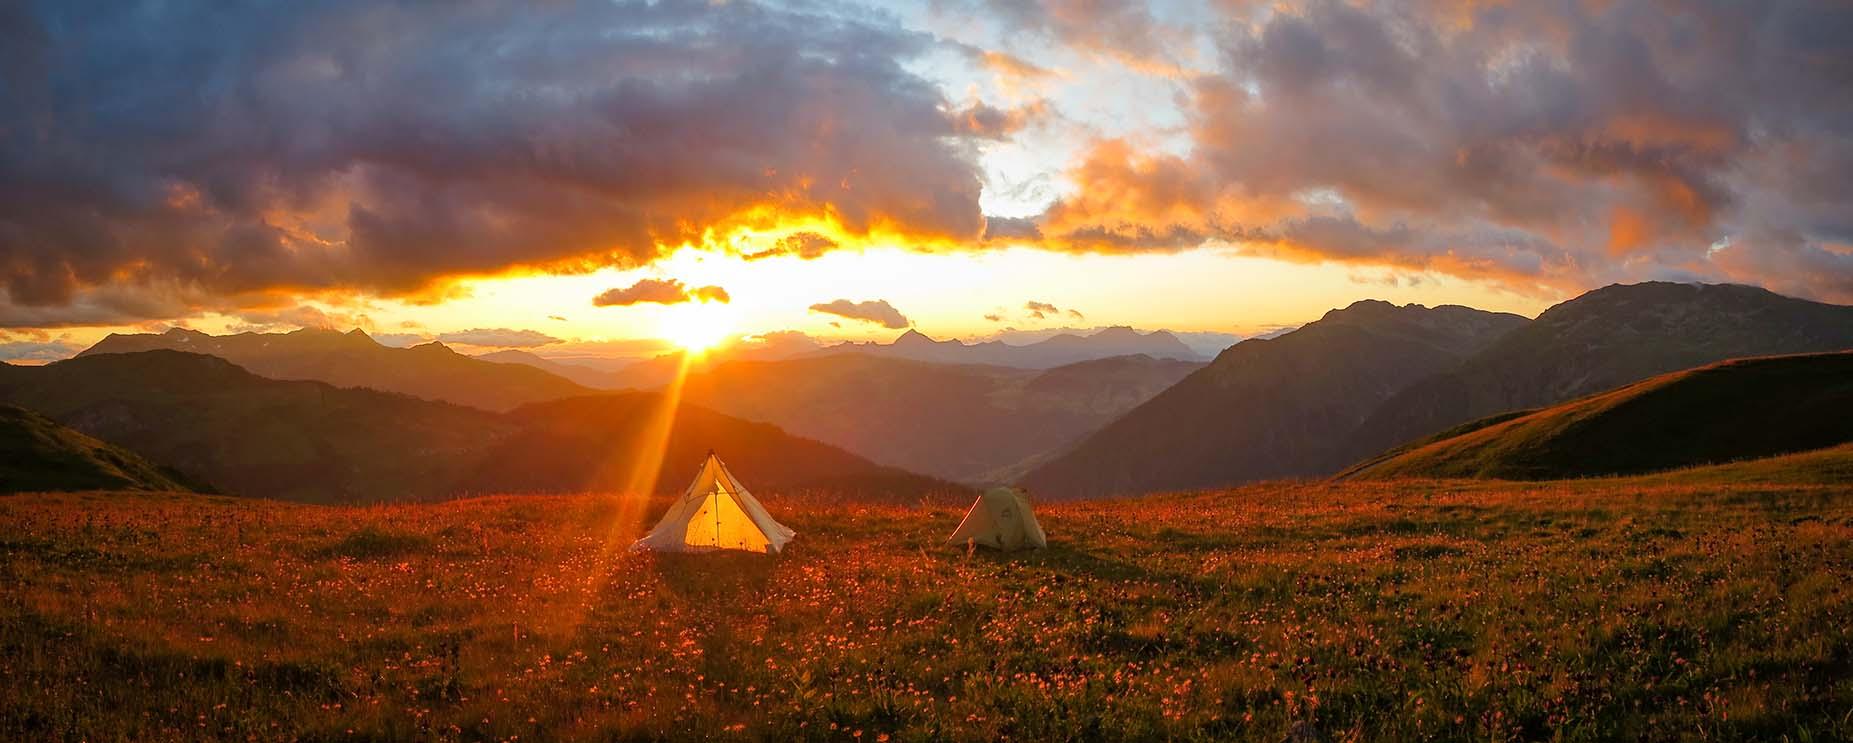 Sejour Liberte Itinerance Bivouac Slow Rando Beaufortain 2020 Sunset